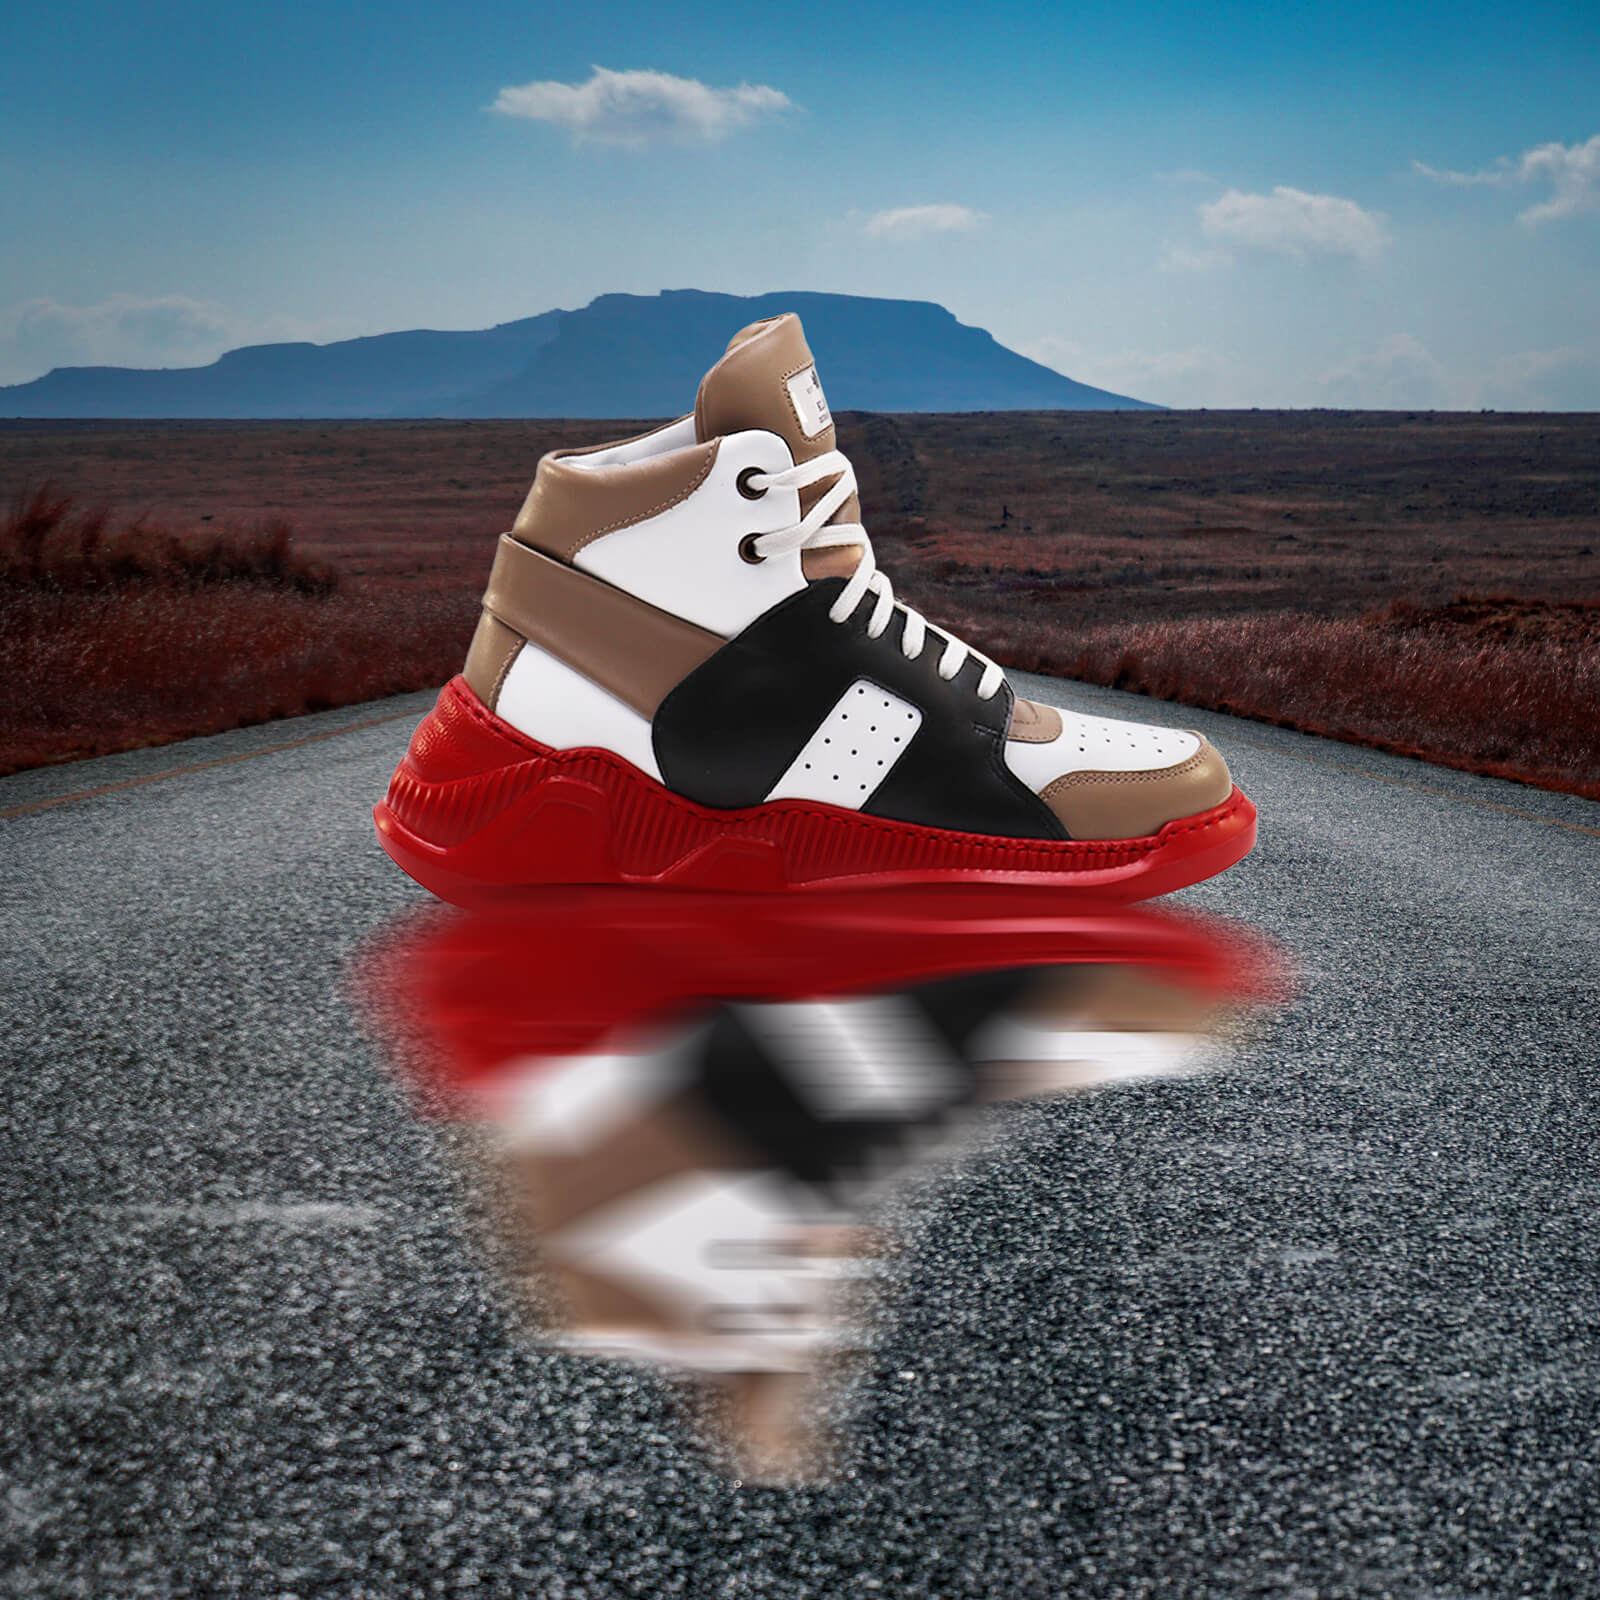 KLASIX CUSTOM FOOTWEAR Debuts Handcrafted Custom Italian Kicks